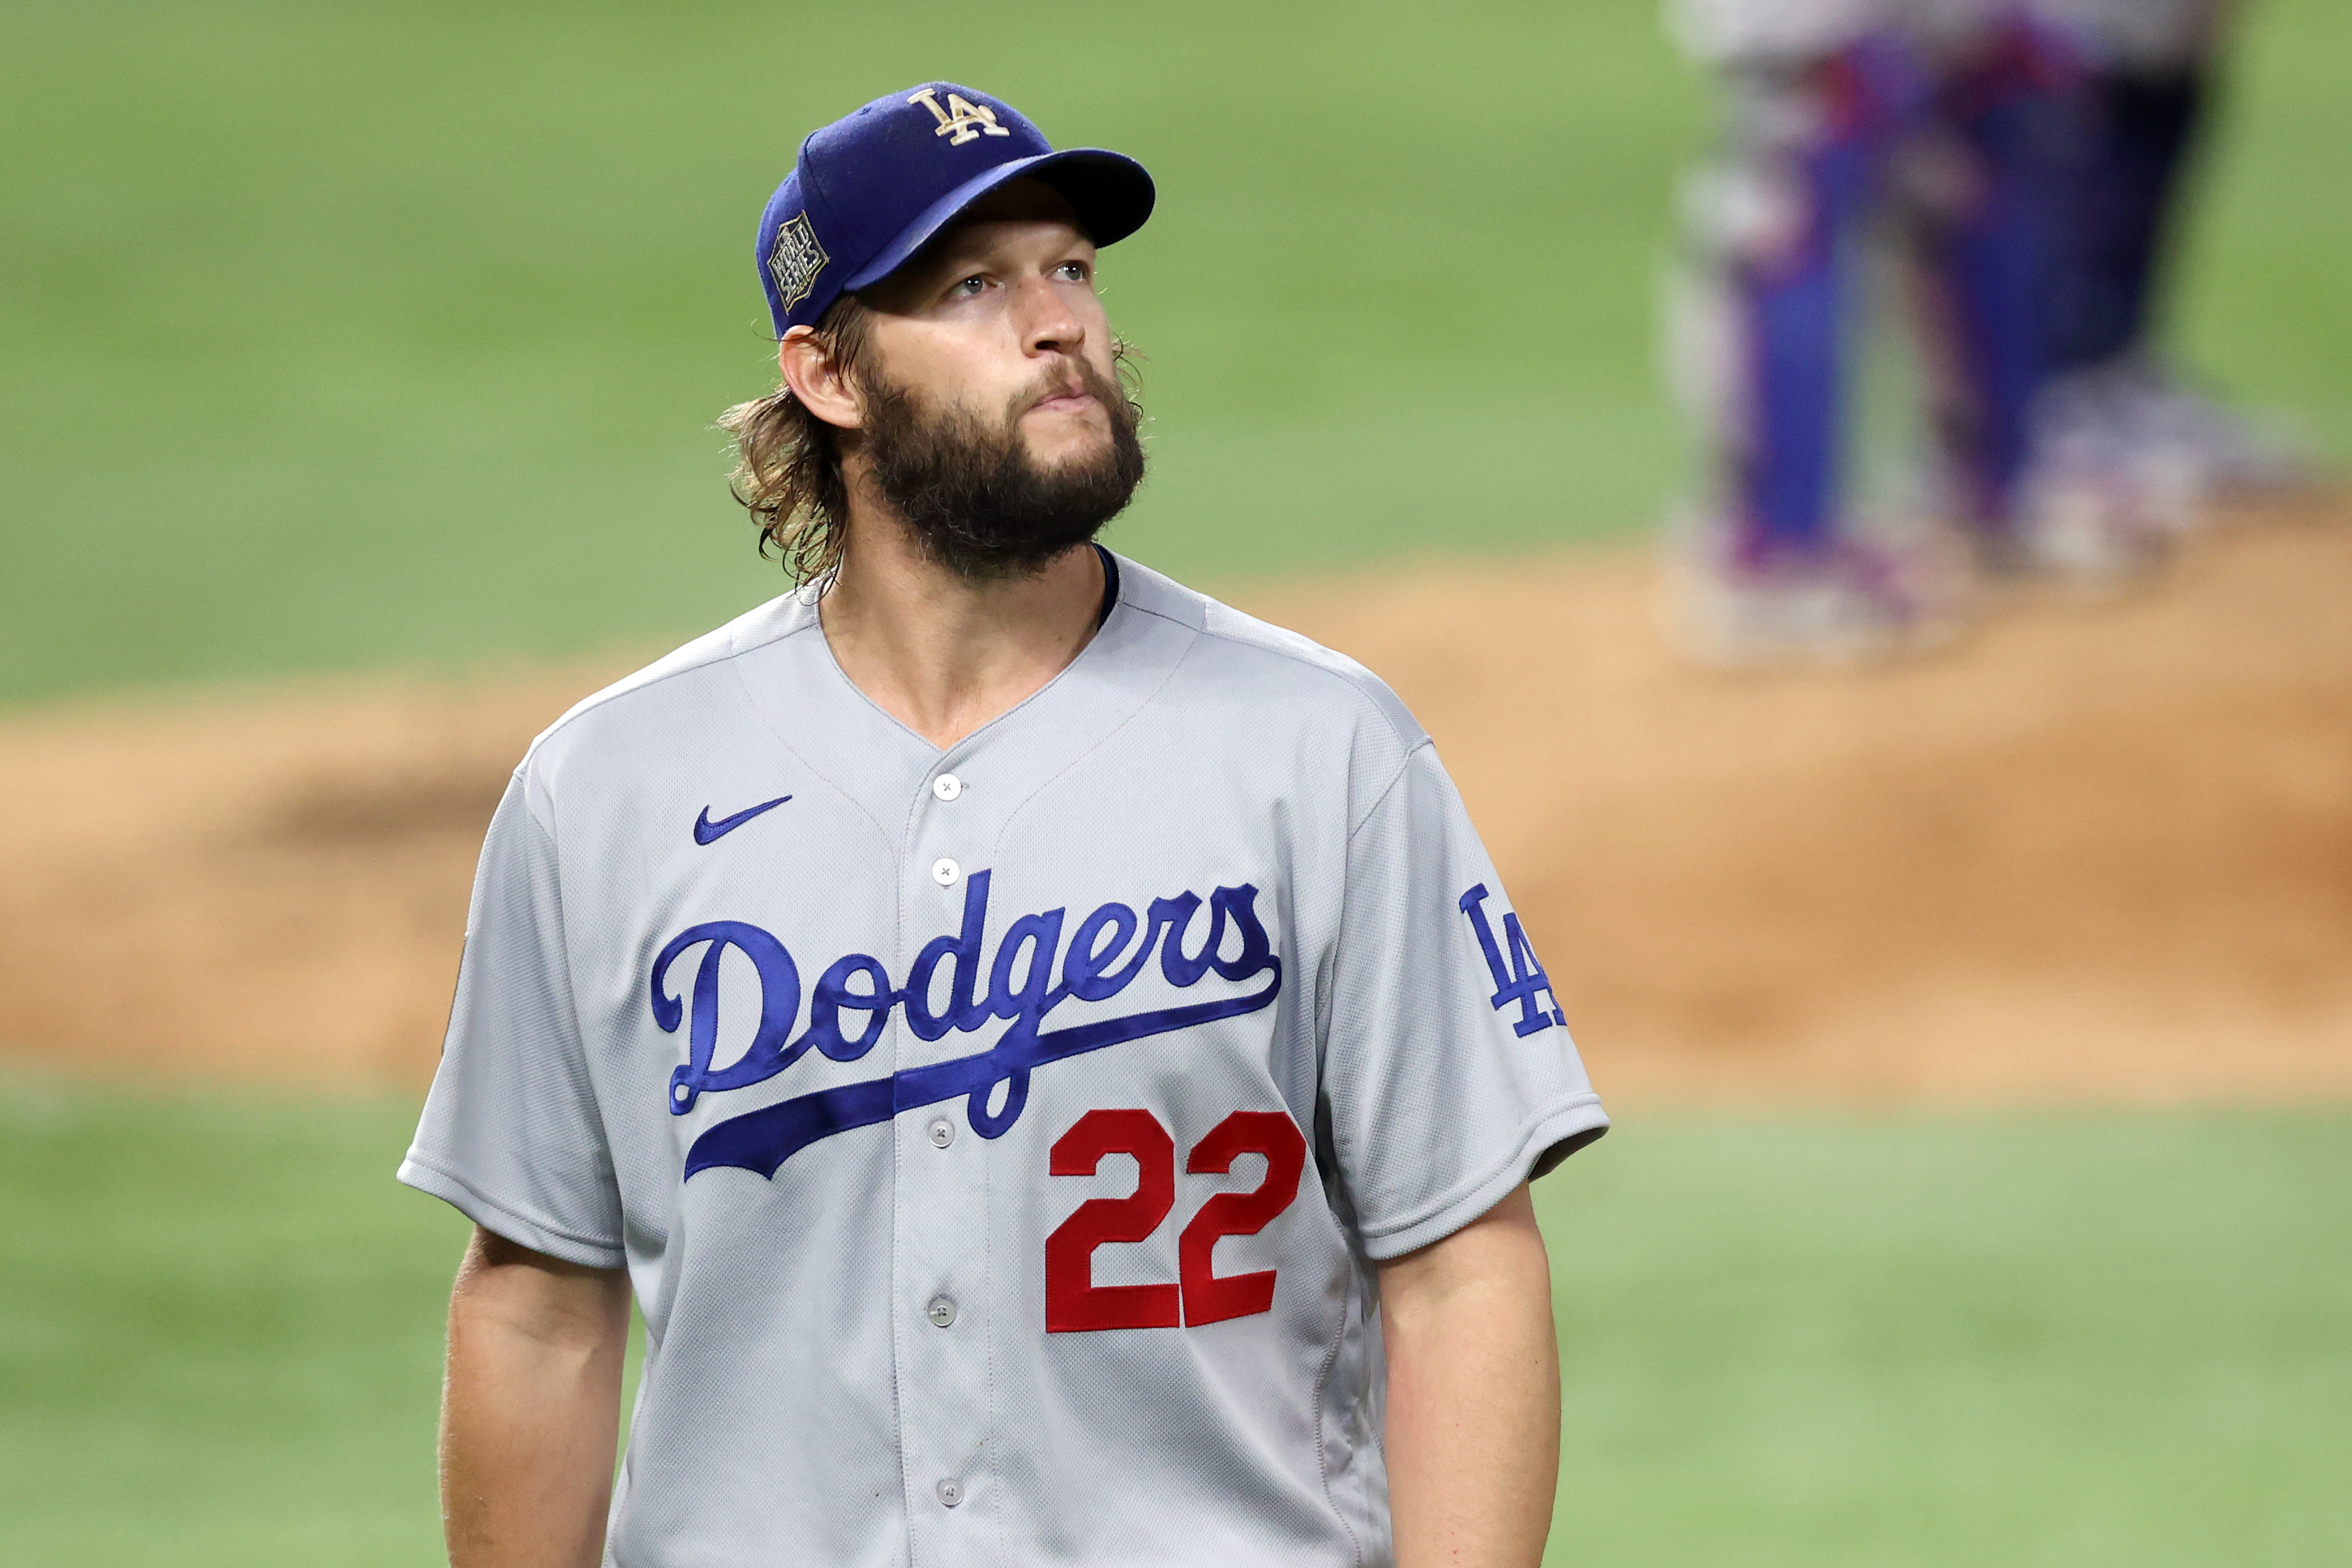 世界系列 - 洛杉矶Dodgers V Tampa Bay Rays  - 比赛五